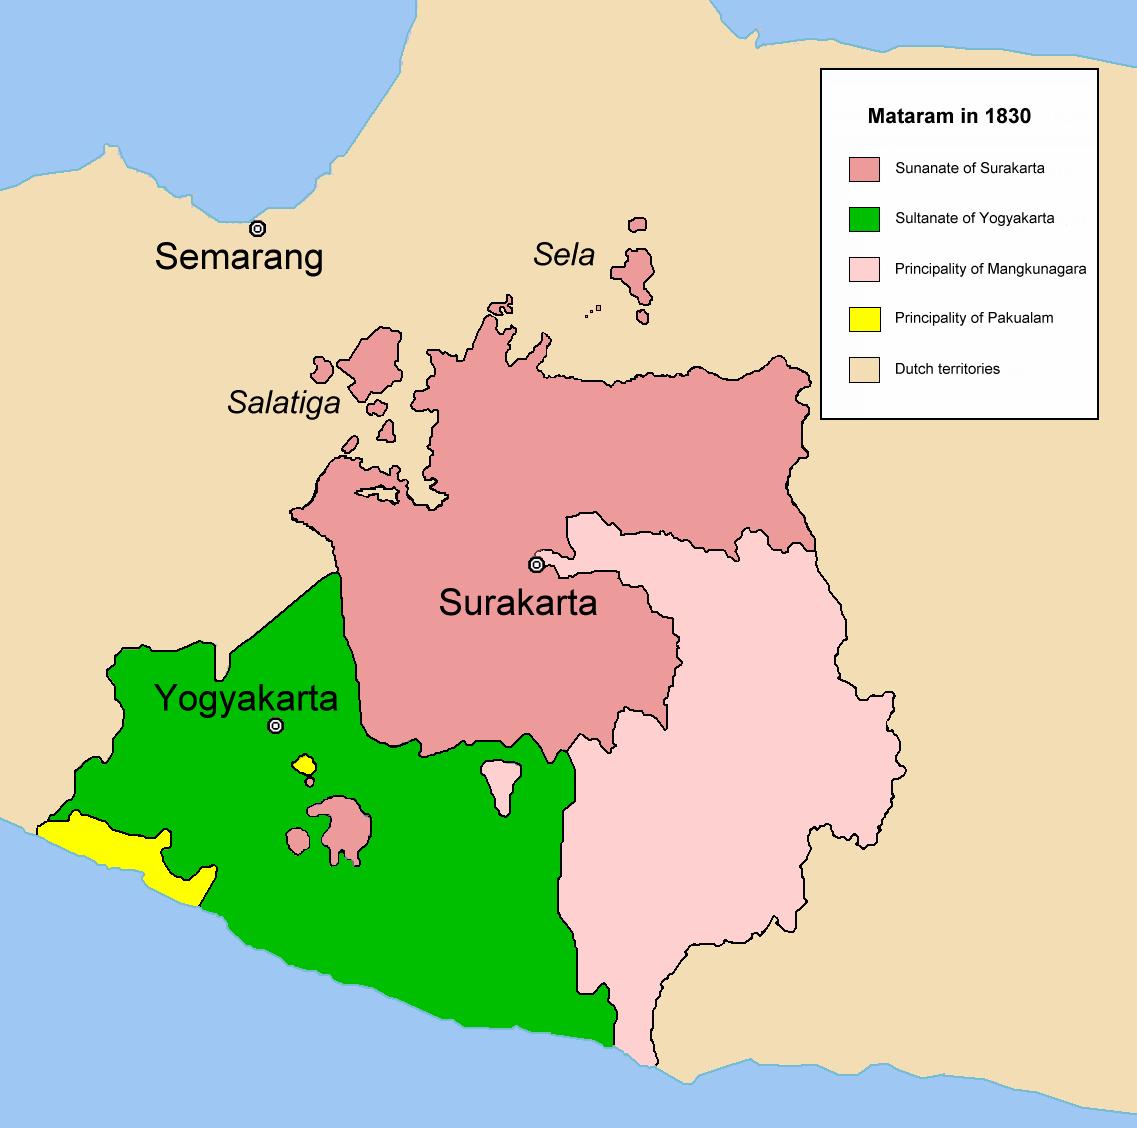 FileMataram 1830enpng Wikimedia Commons